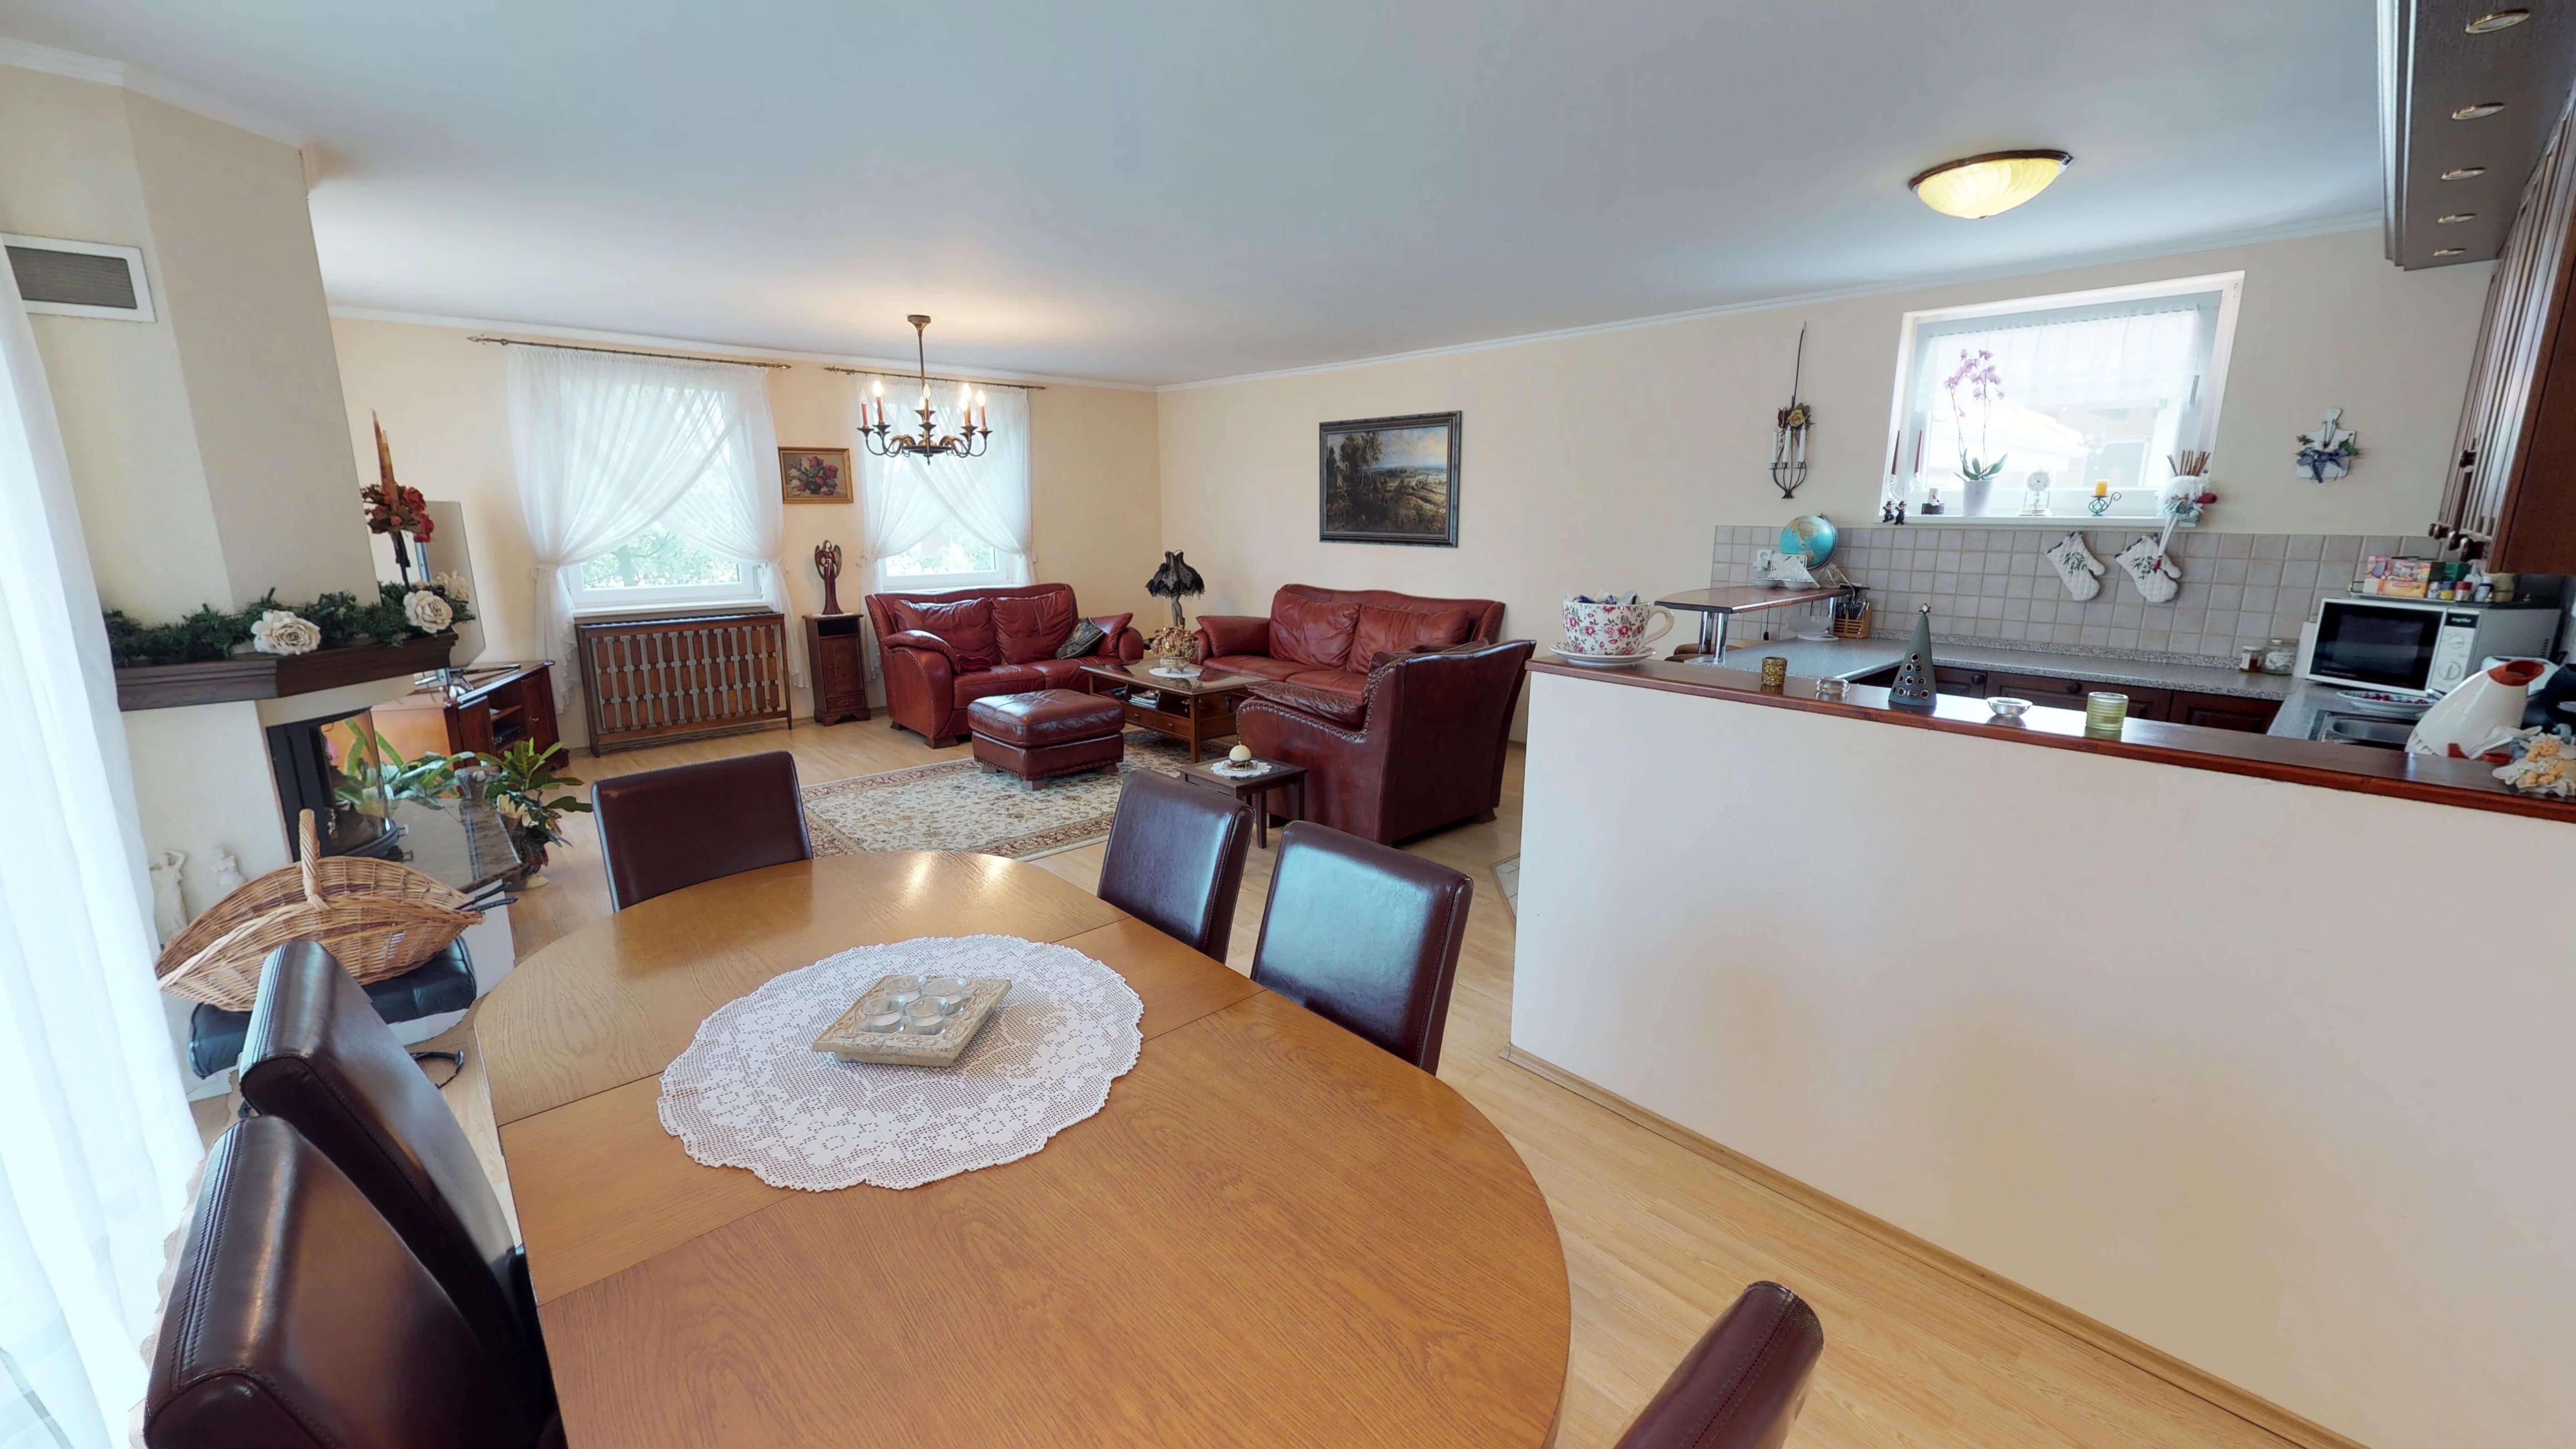 Rodinný dom na uzavretej ulici, Vojtechovce, 2 – generačný 6 izbový, úžitková 270m2, pozemok 600m2, garáž-1